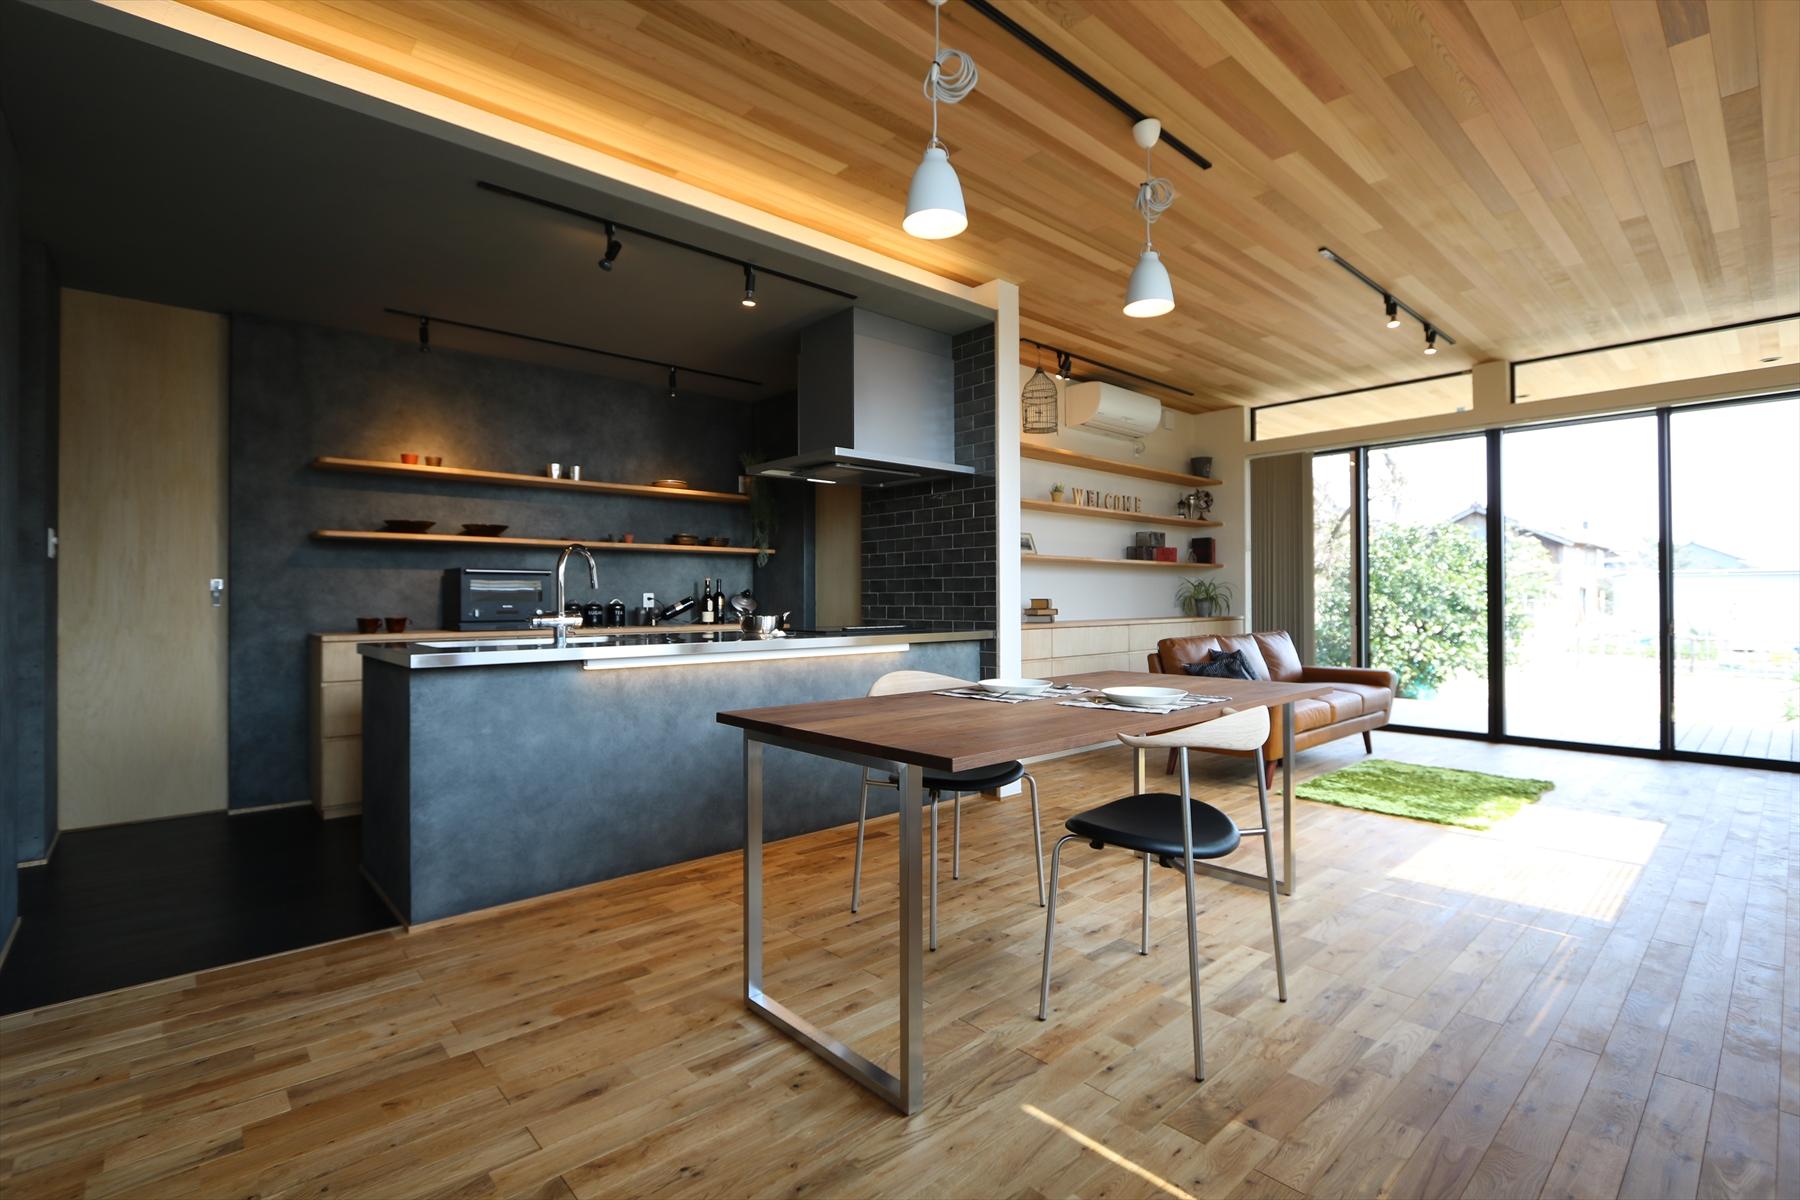 NATURAL× HIGH MODERN×平屋|石川県金沢市の注文住宅・デザイン性・新築の家・戸建て|E-HOUSE